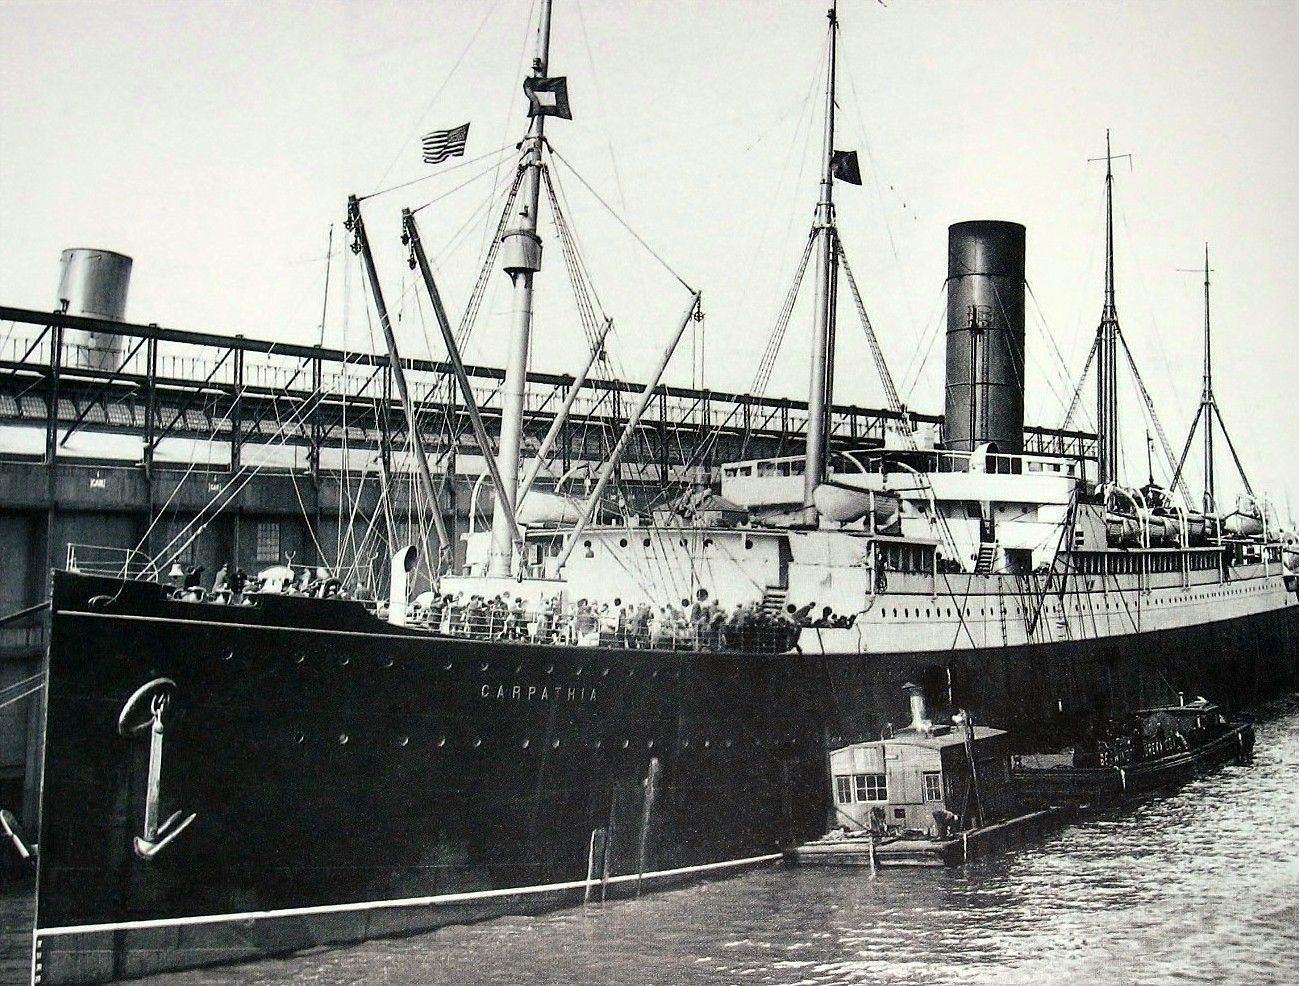 1000 images about steam ship vapeur 2 on pinterest steamers isambard kingdom brunel and. Black Bedroom Furniture Sets. Home Design Ideas